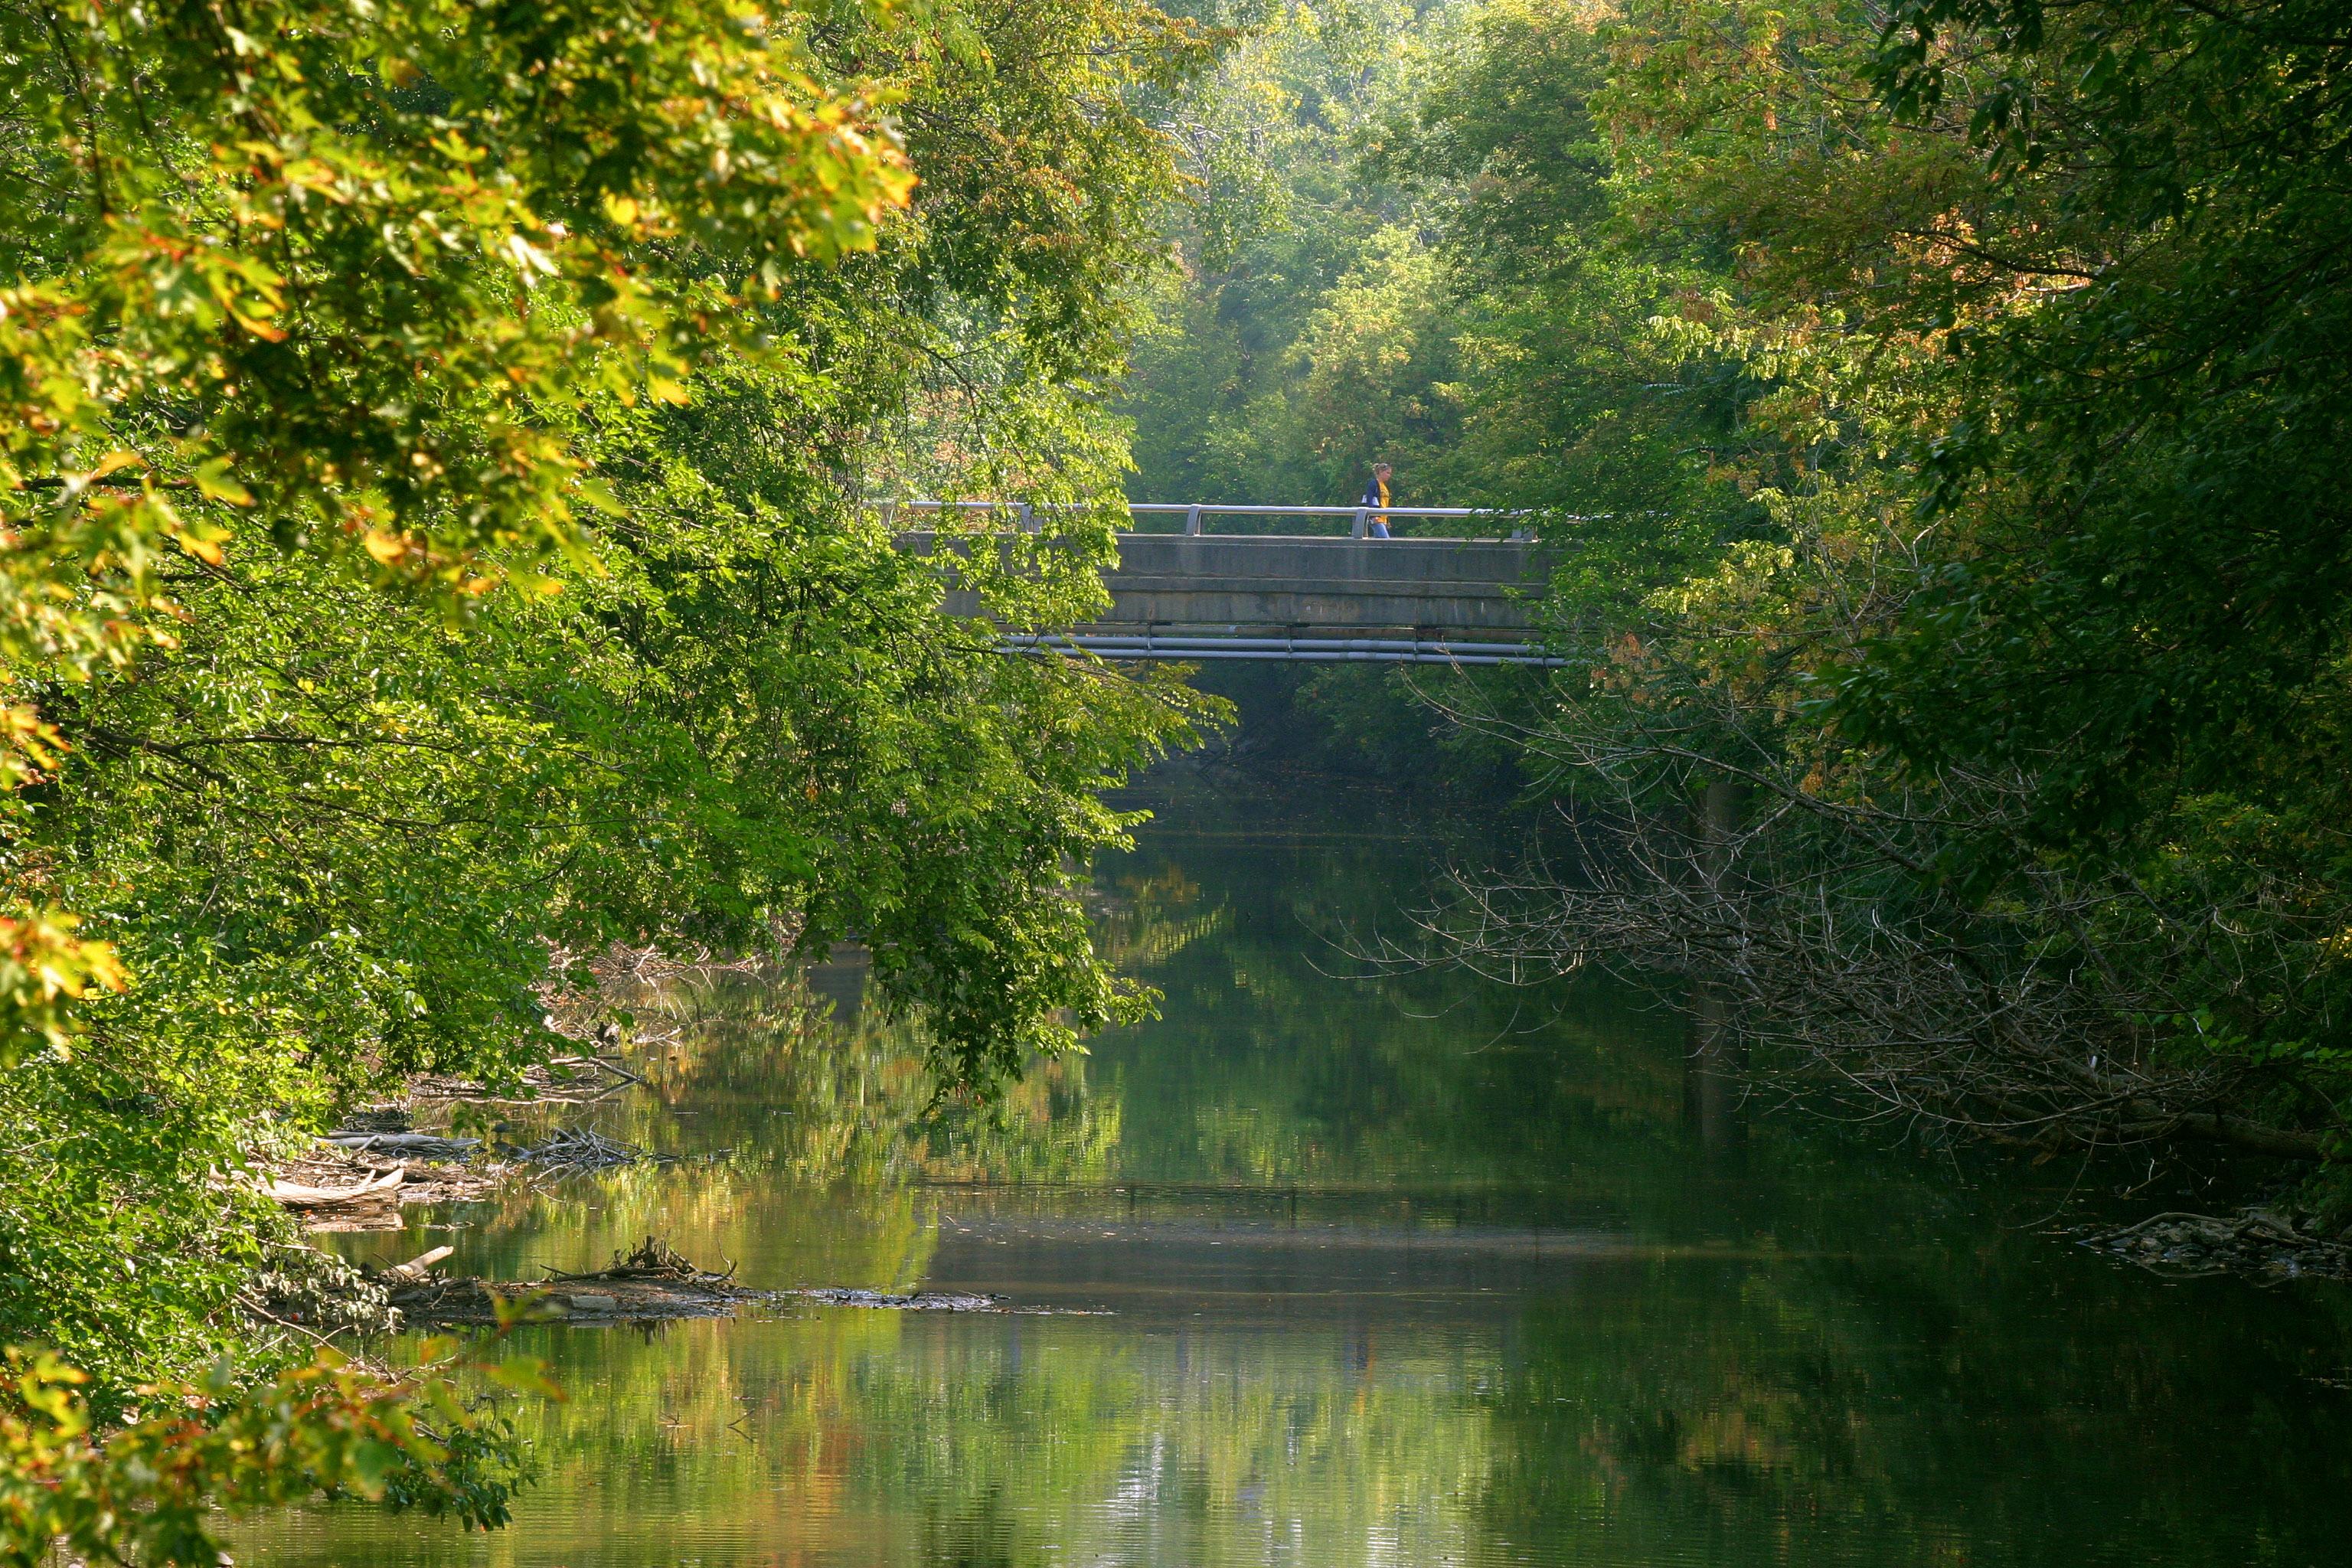 Ottawa river  DVD 434 CD 278